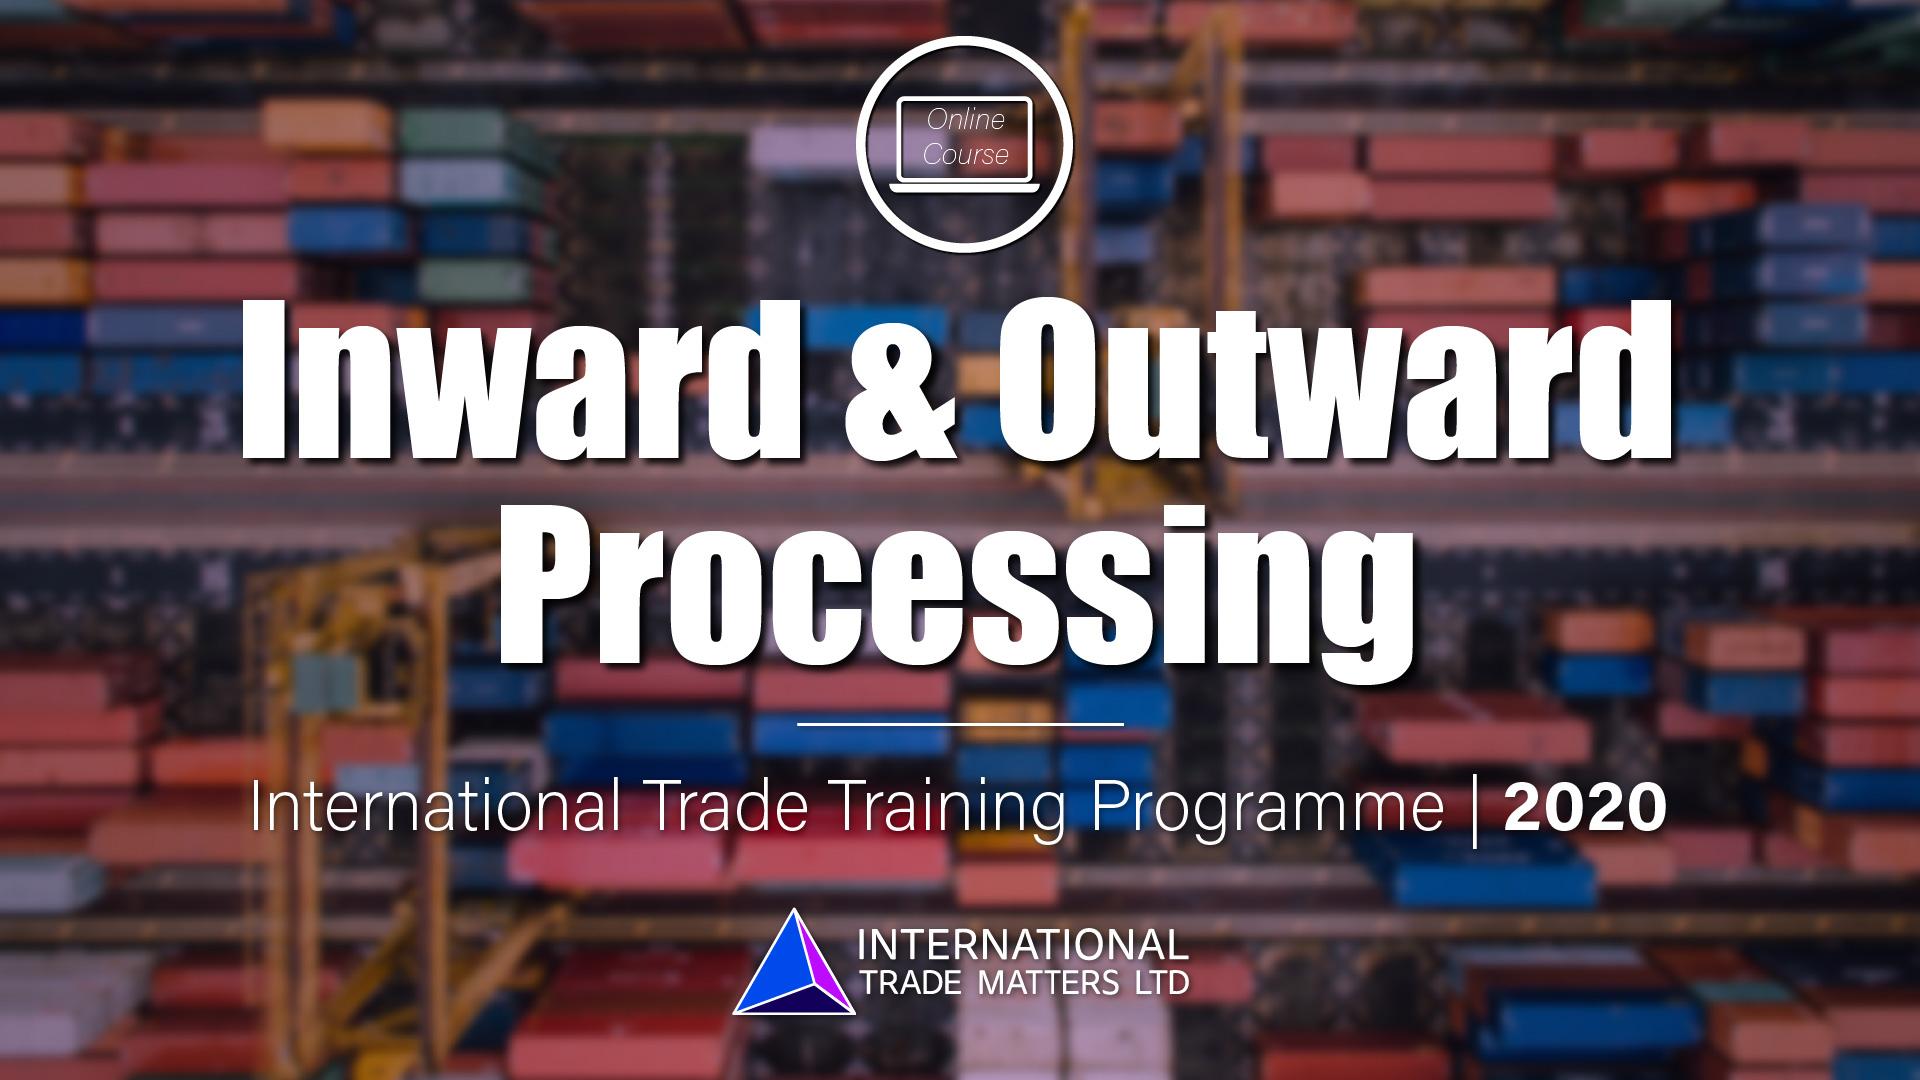 Inward & Outward Processing Course